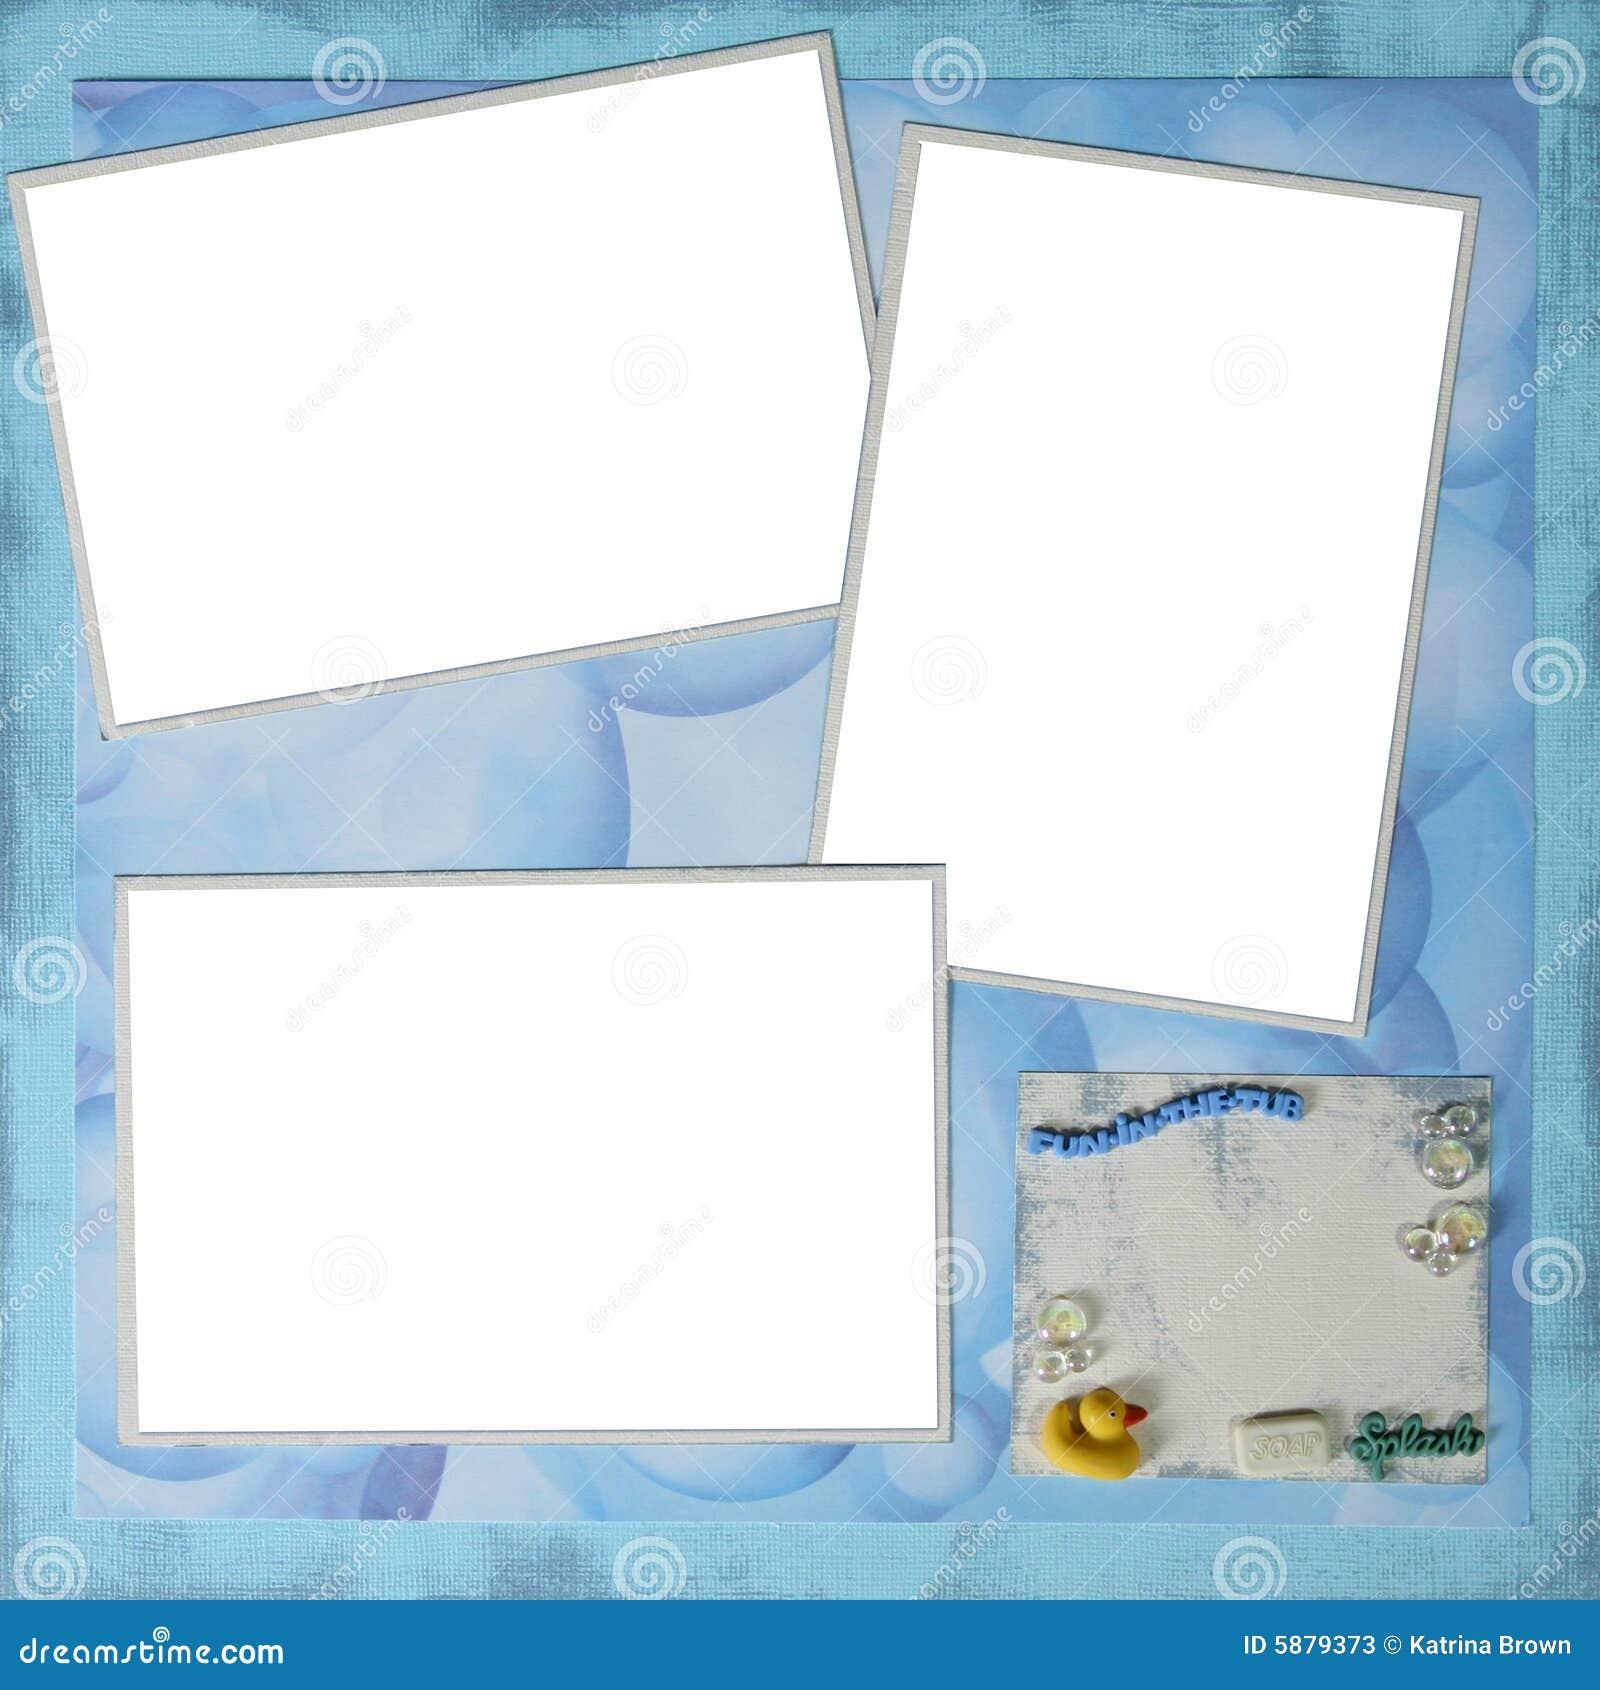 bath time theme digital scrapbooking page 12 x 12 stock image